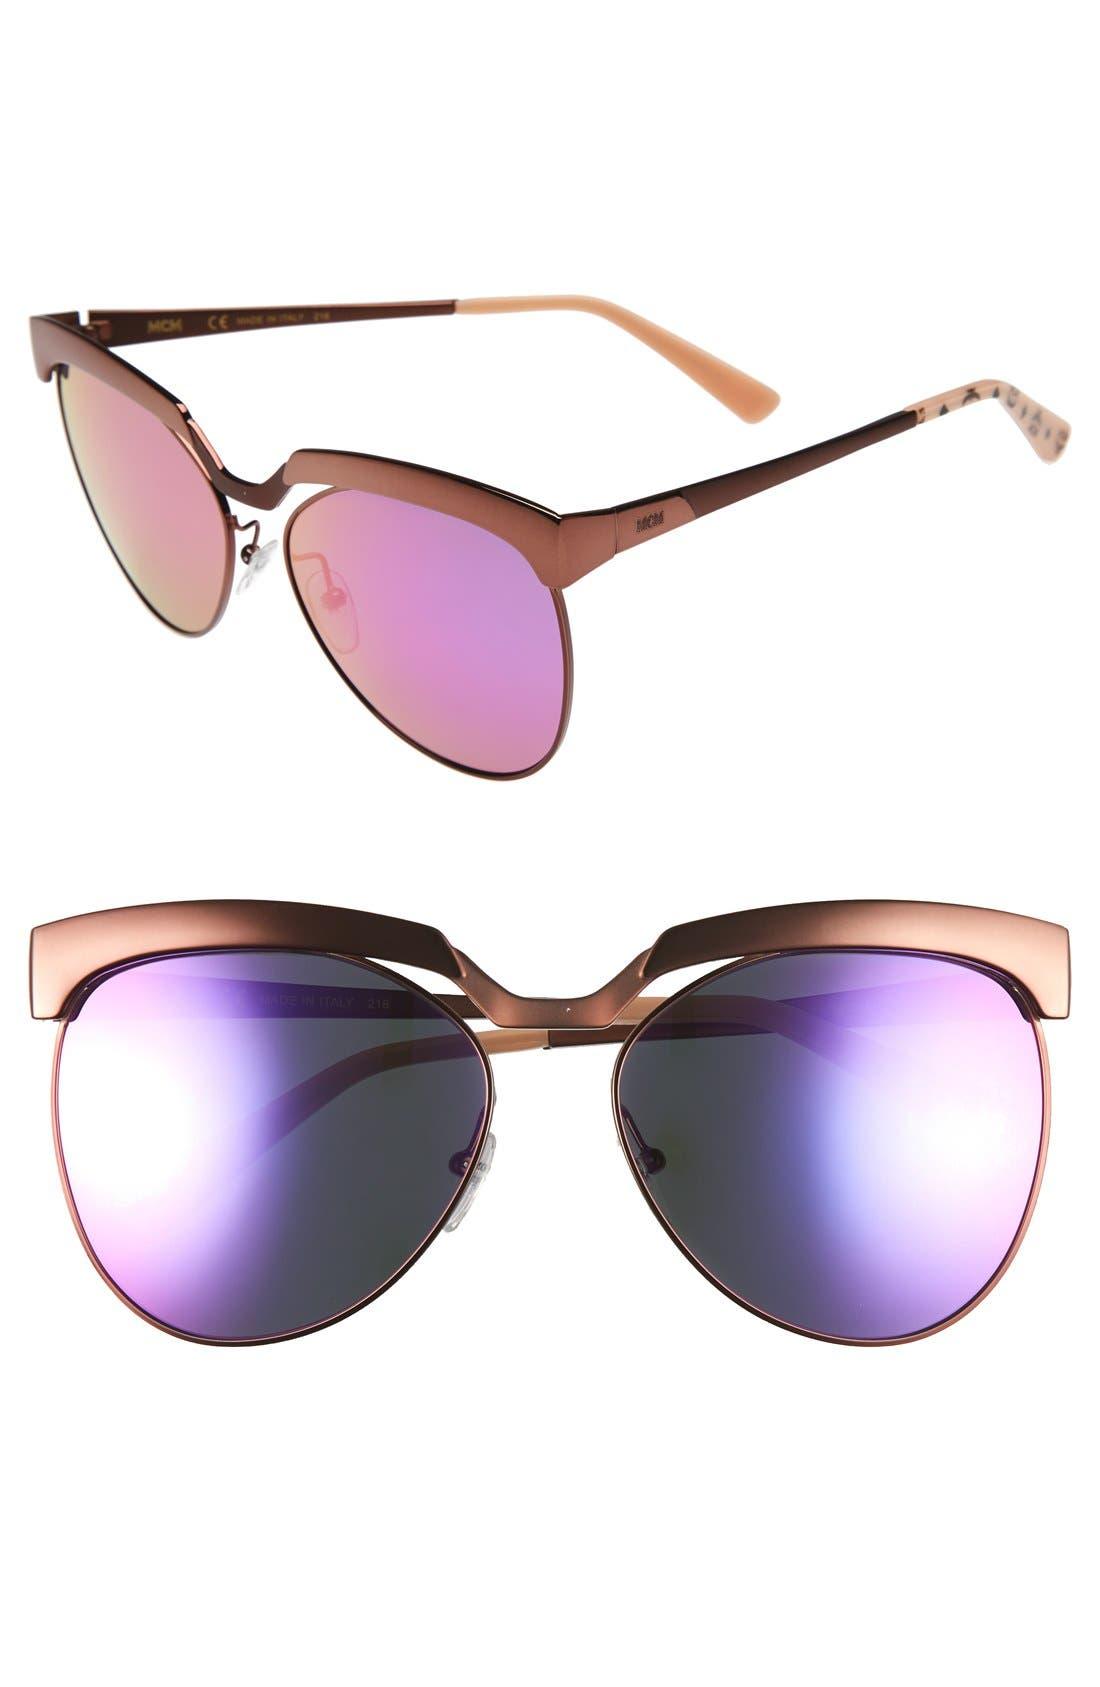 Alternate Image 1 Selected - MCM 58mm Sunglasses